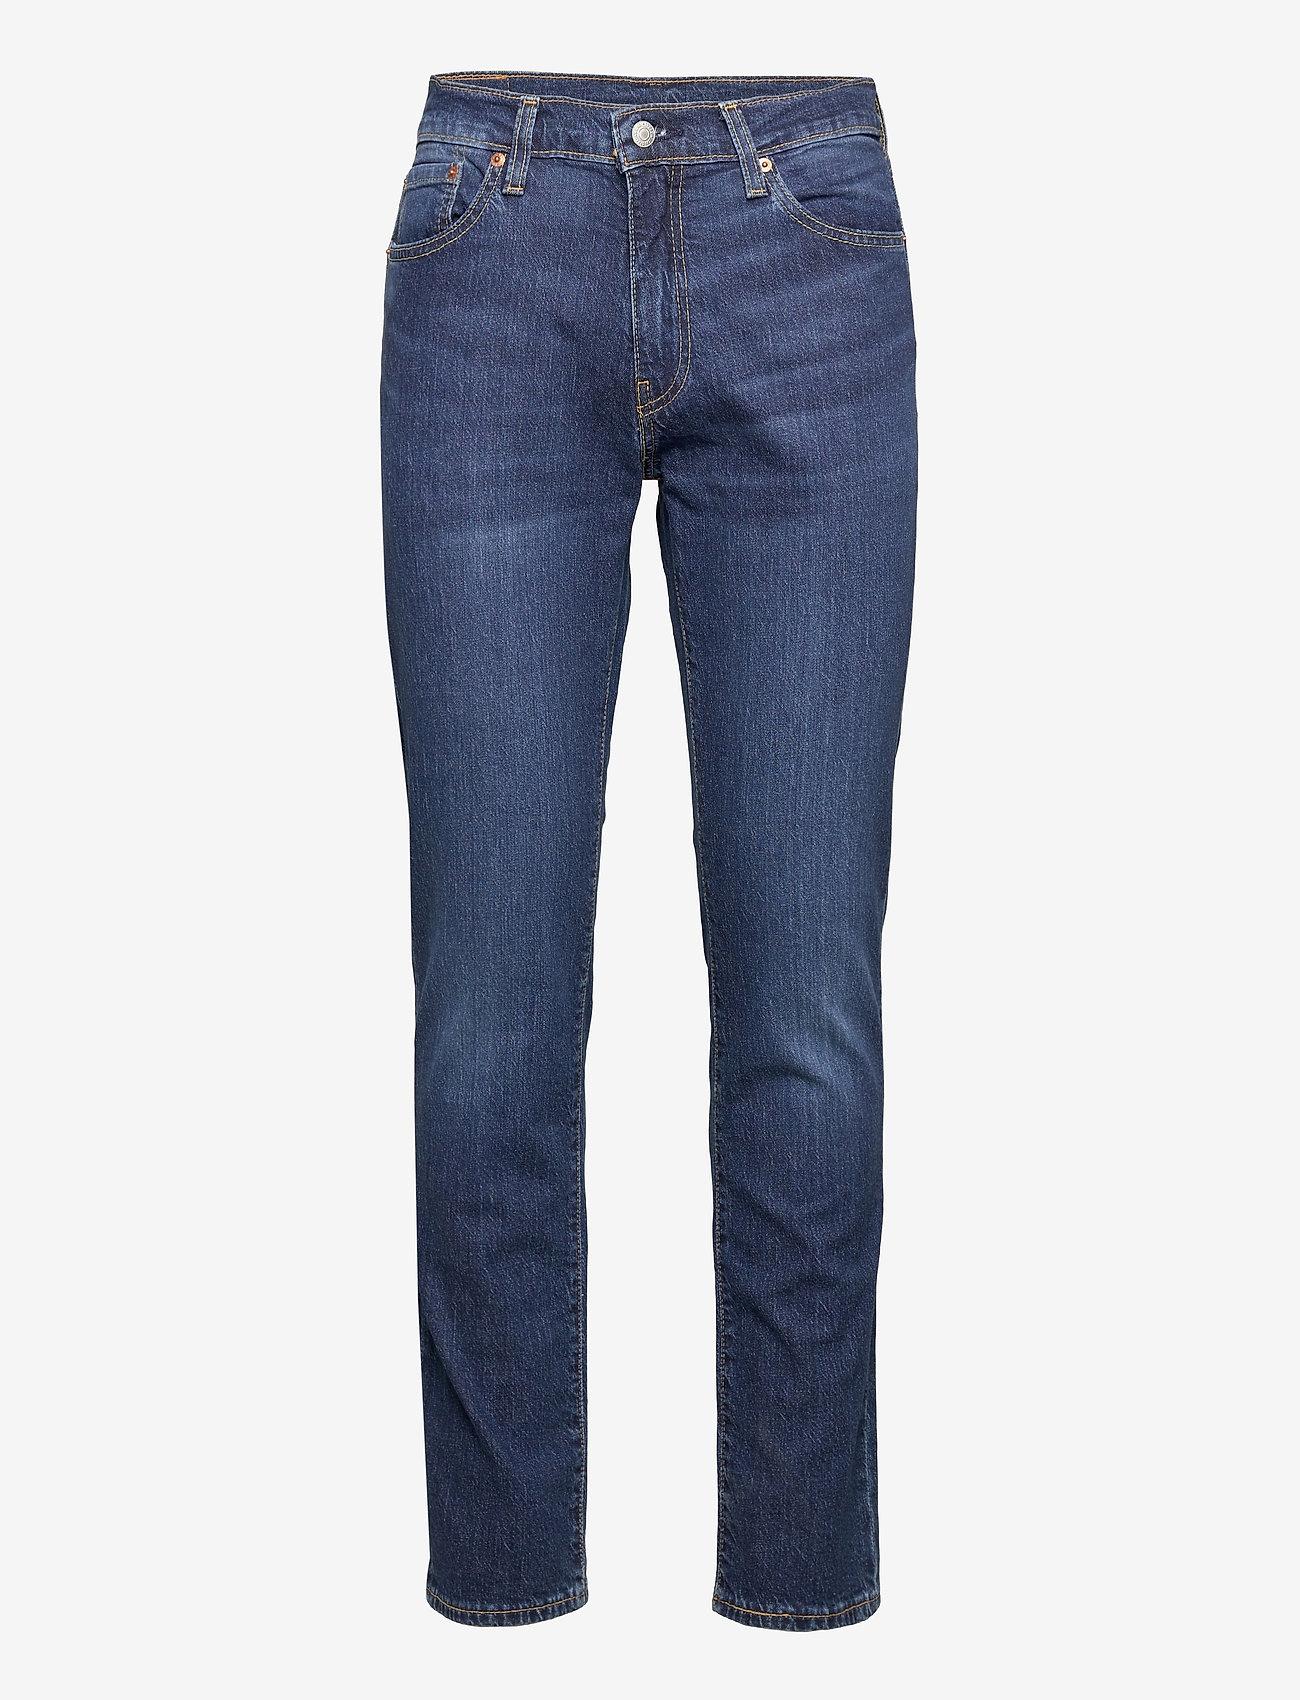 LEVI´S Men - 511 SLIM LAURELHURST SHOCKING - slim jeans - dark indigo - flat finish - 0